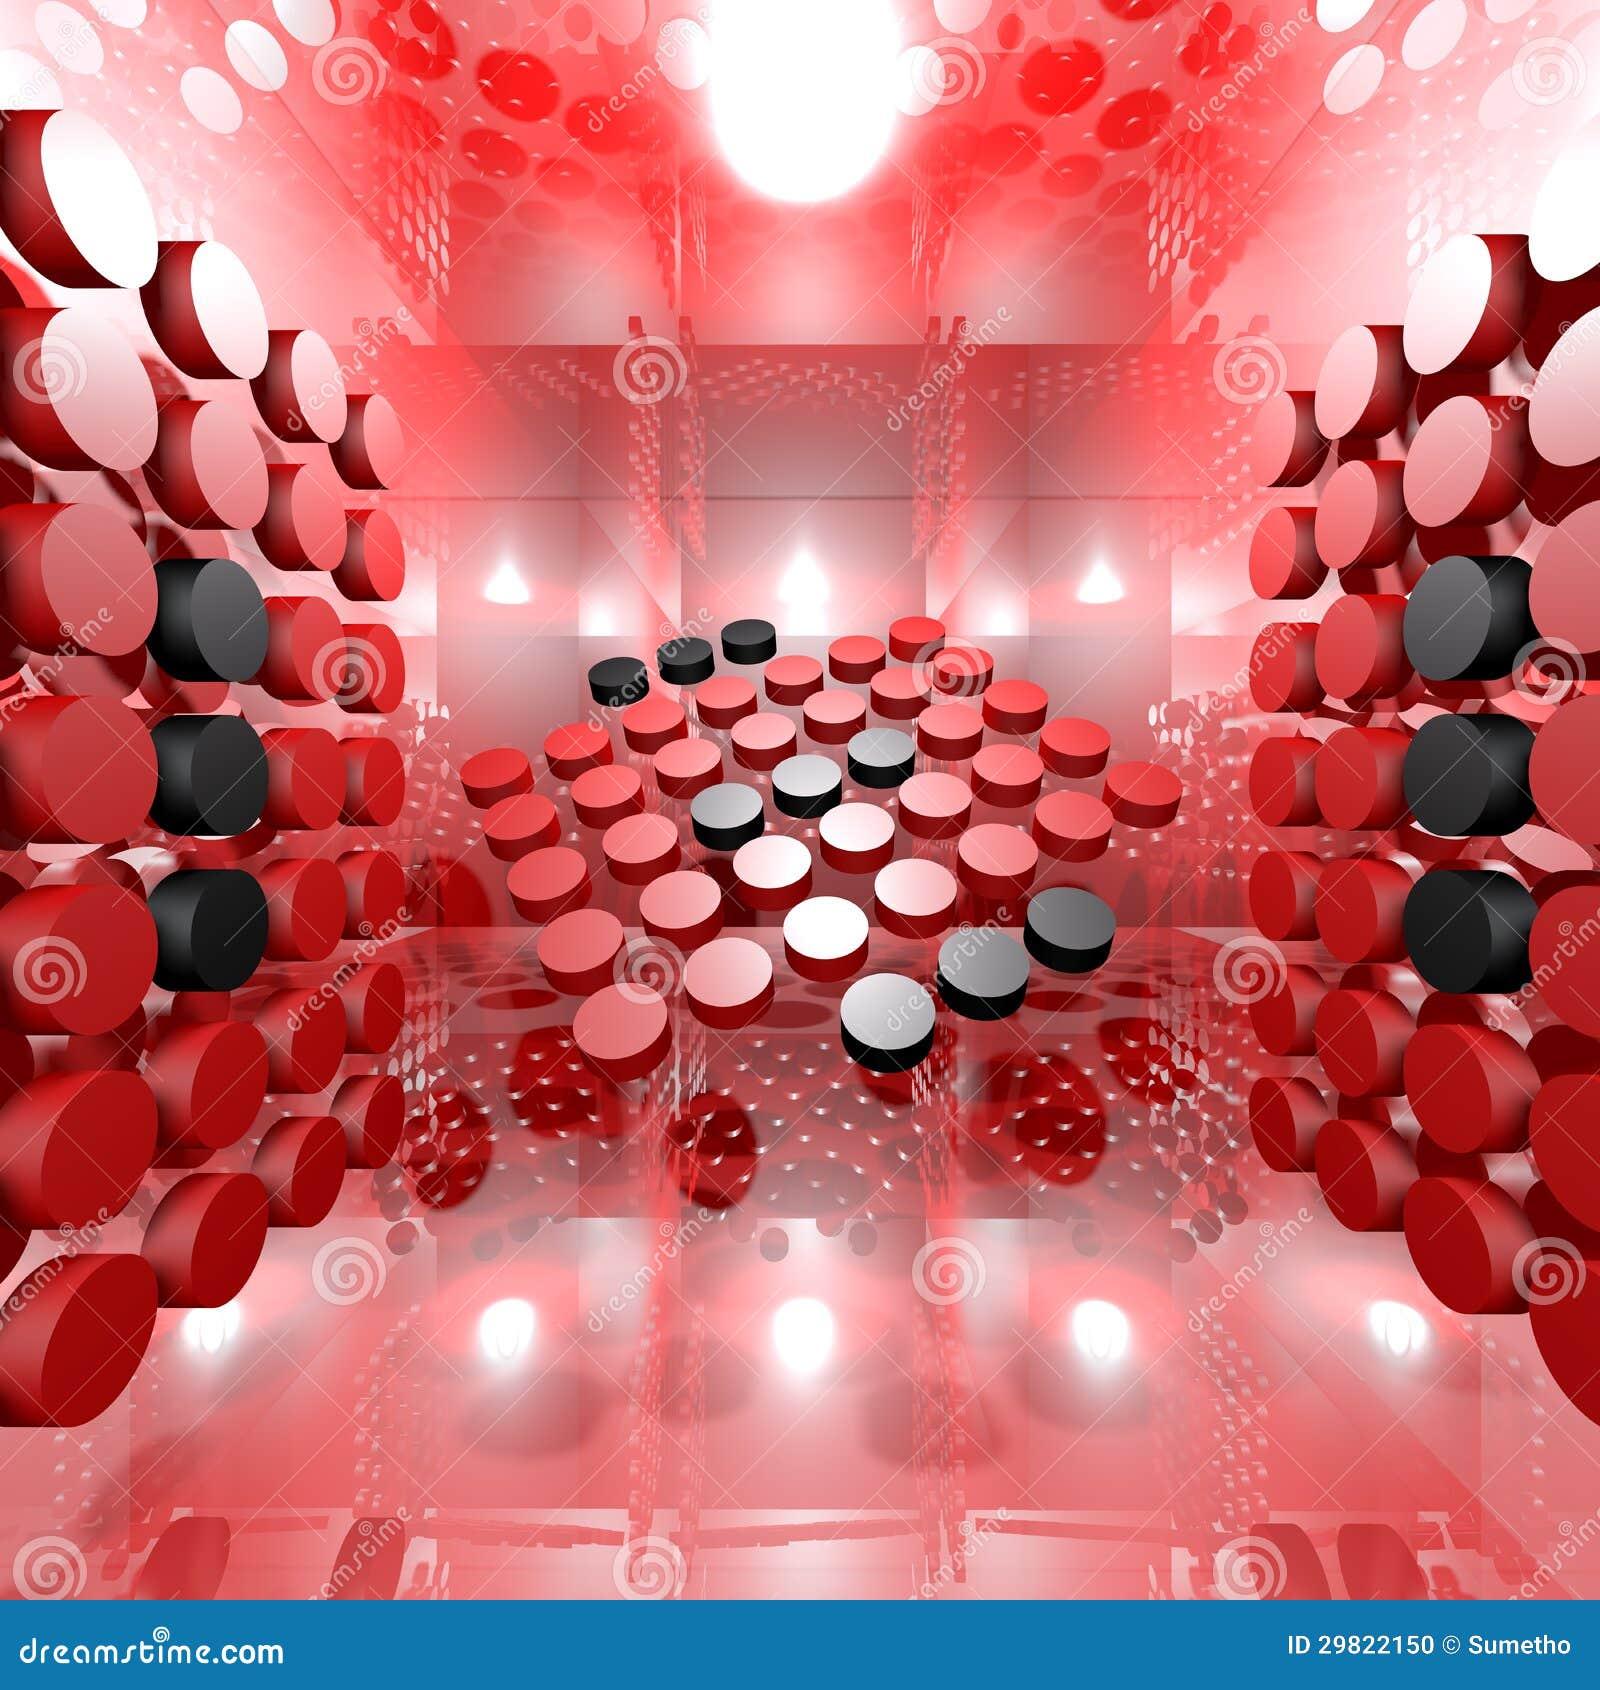 Red Digital Interior Room Stock Photo Image 29822150